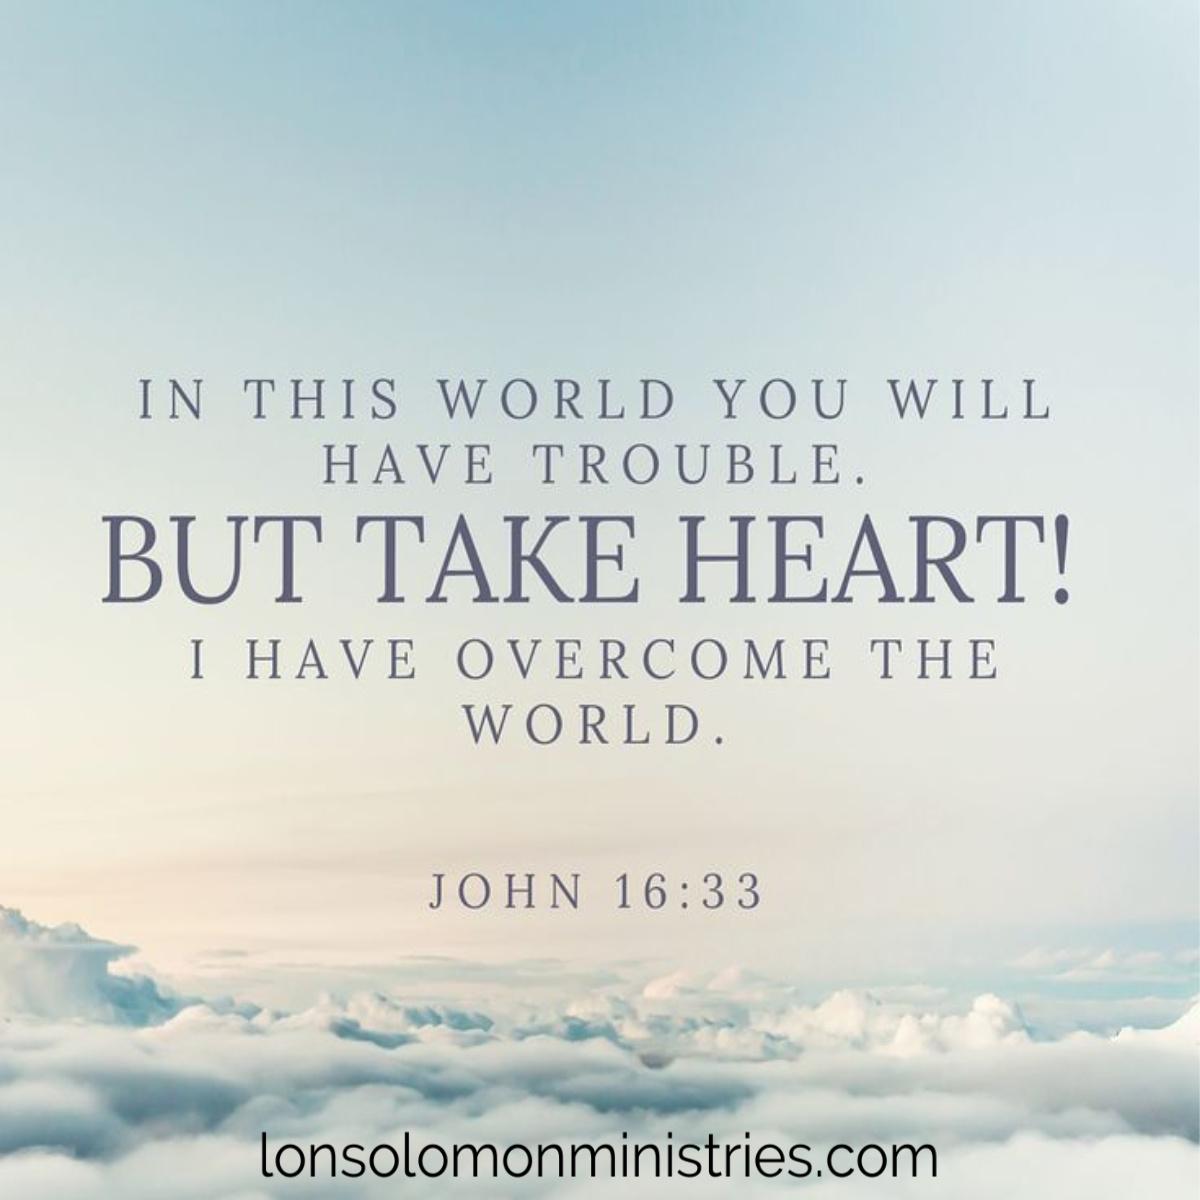 #takeheart